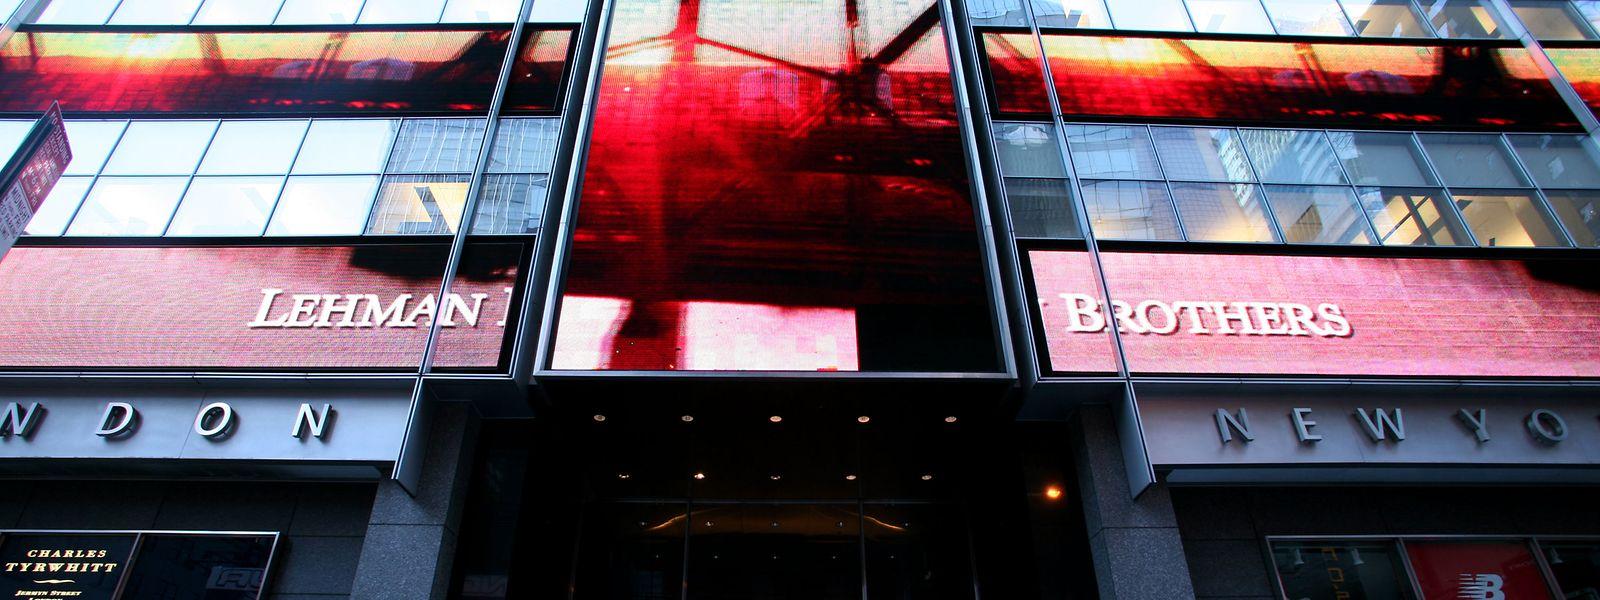 Im September 2008 musste die US-Investmentbank Lehman Brothers Insolvenz anmelden.